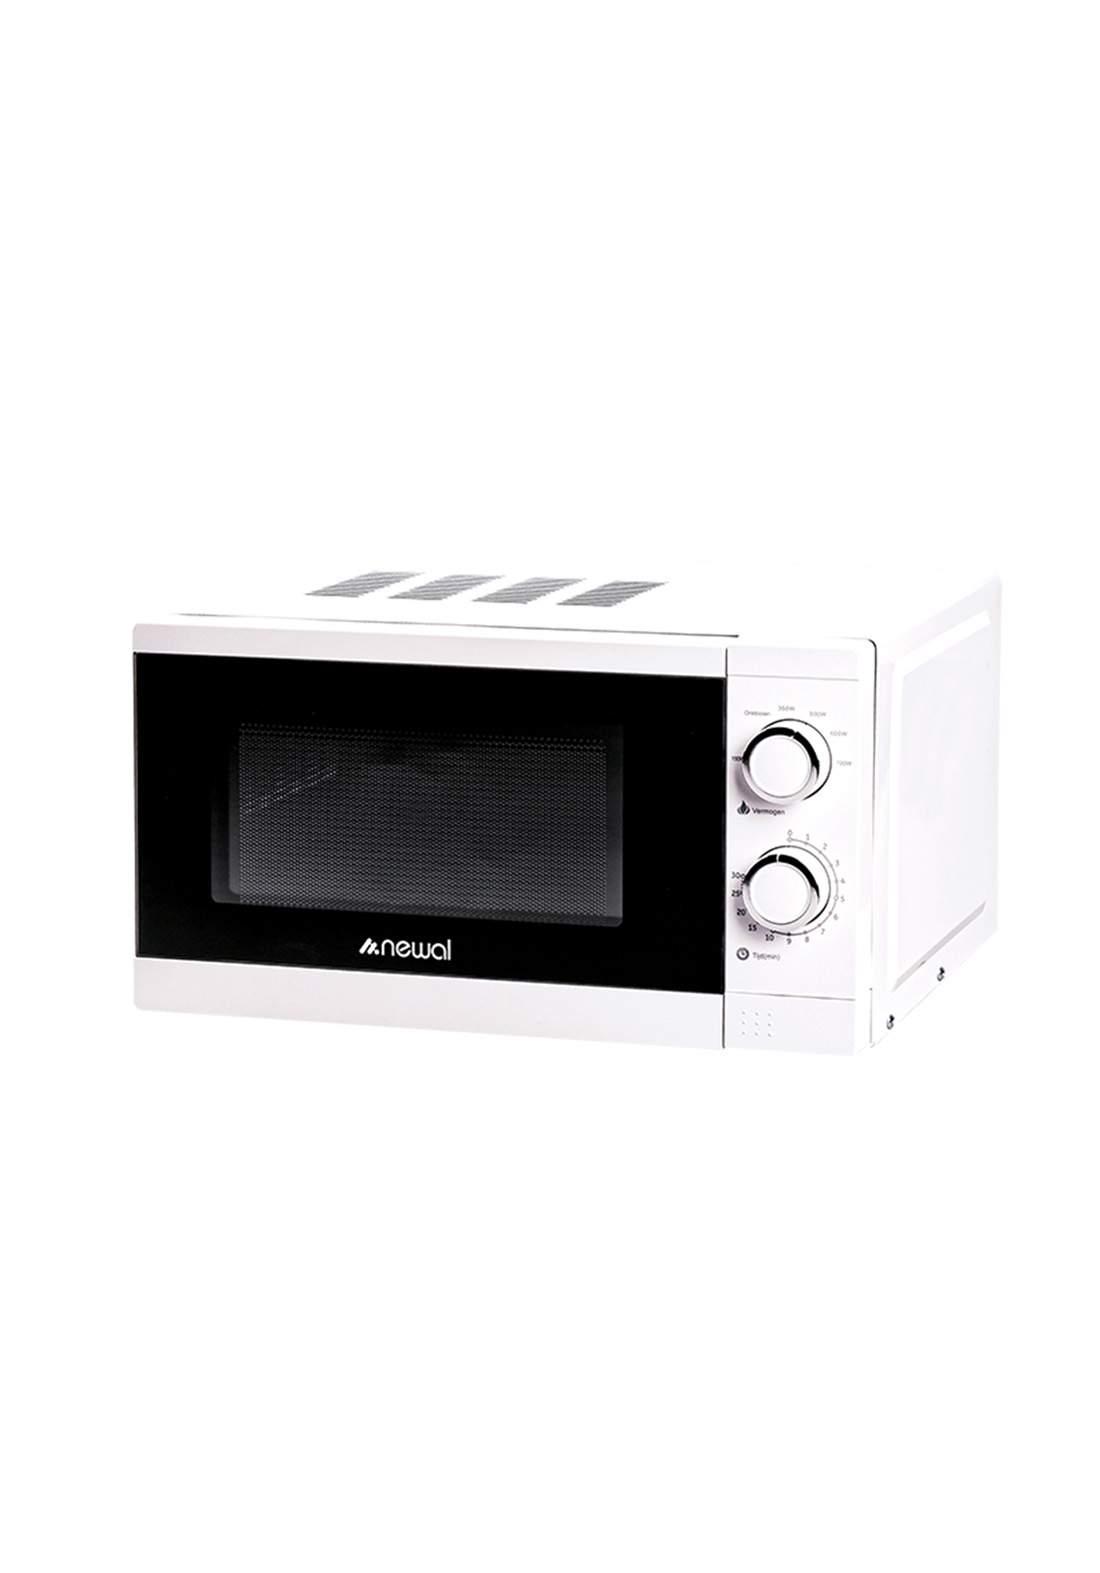 Newal MWO-261-01 Microvawe Oven 20 L فرن مايكرويف